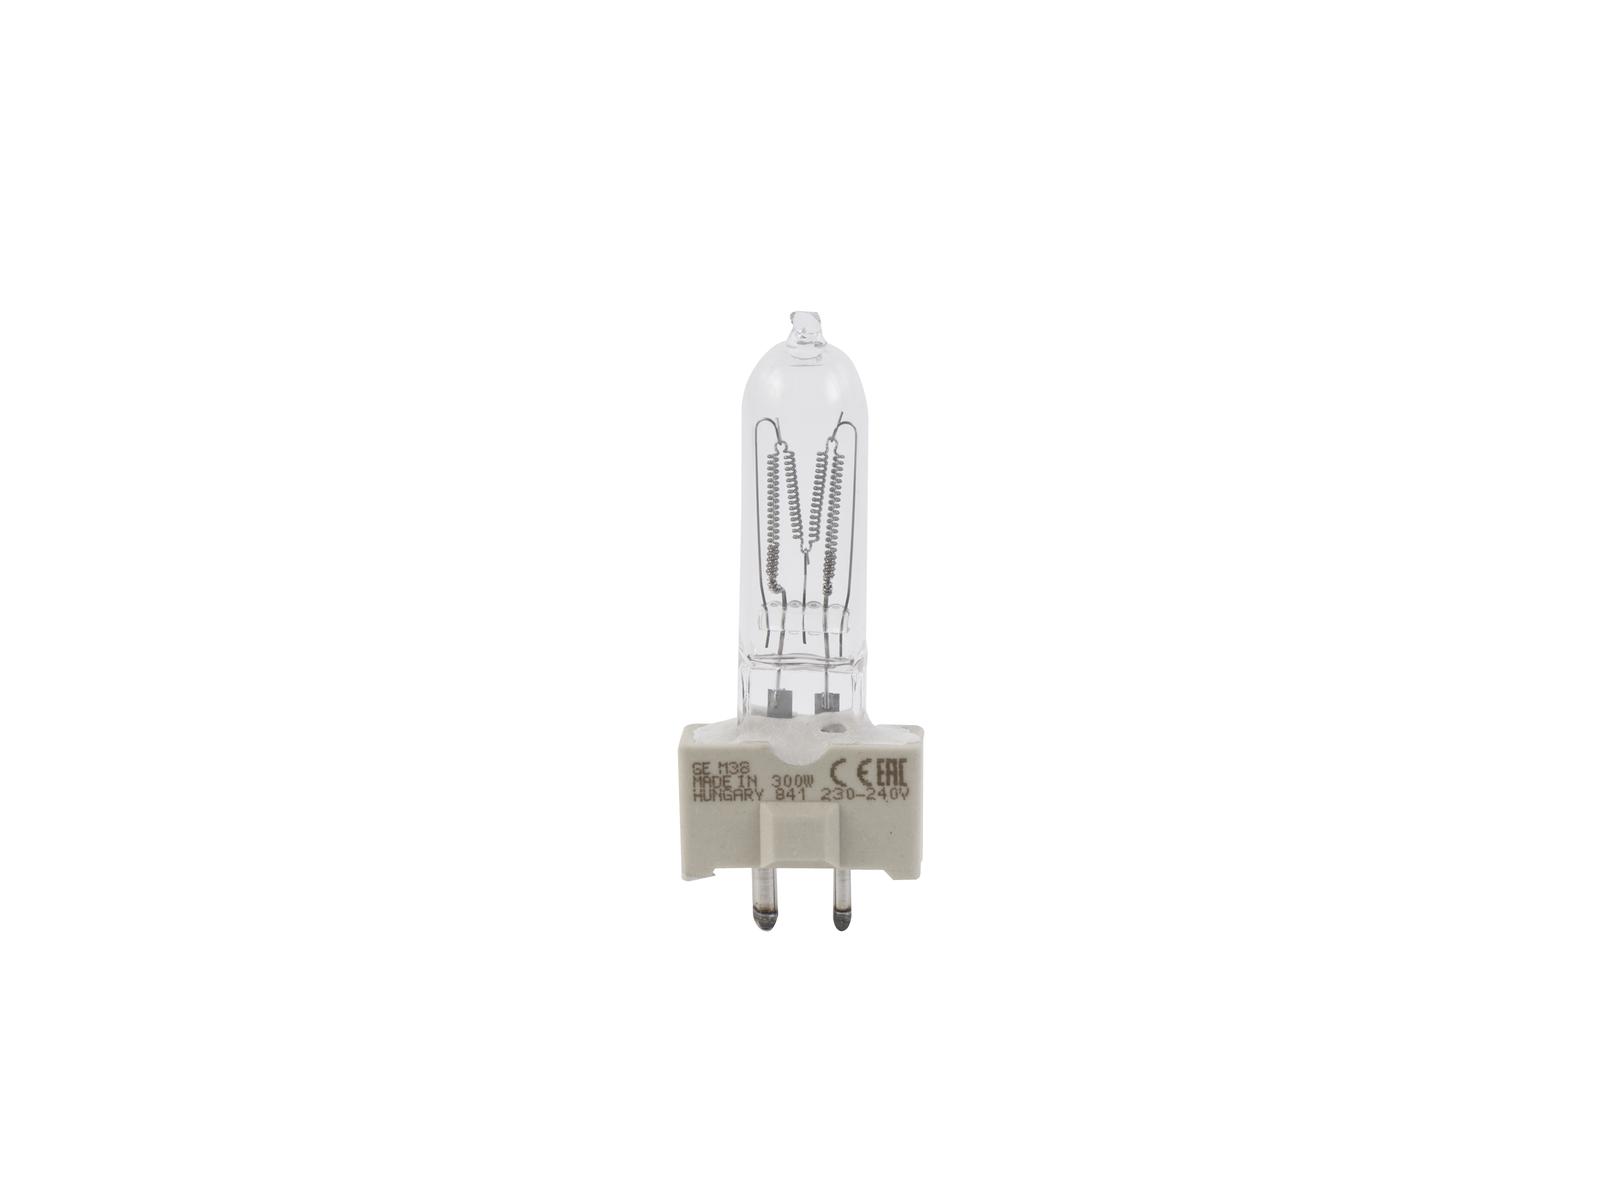 230V/300W GY 9.5 M38 LL GE, sv. zdroj